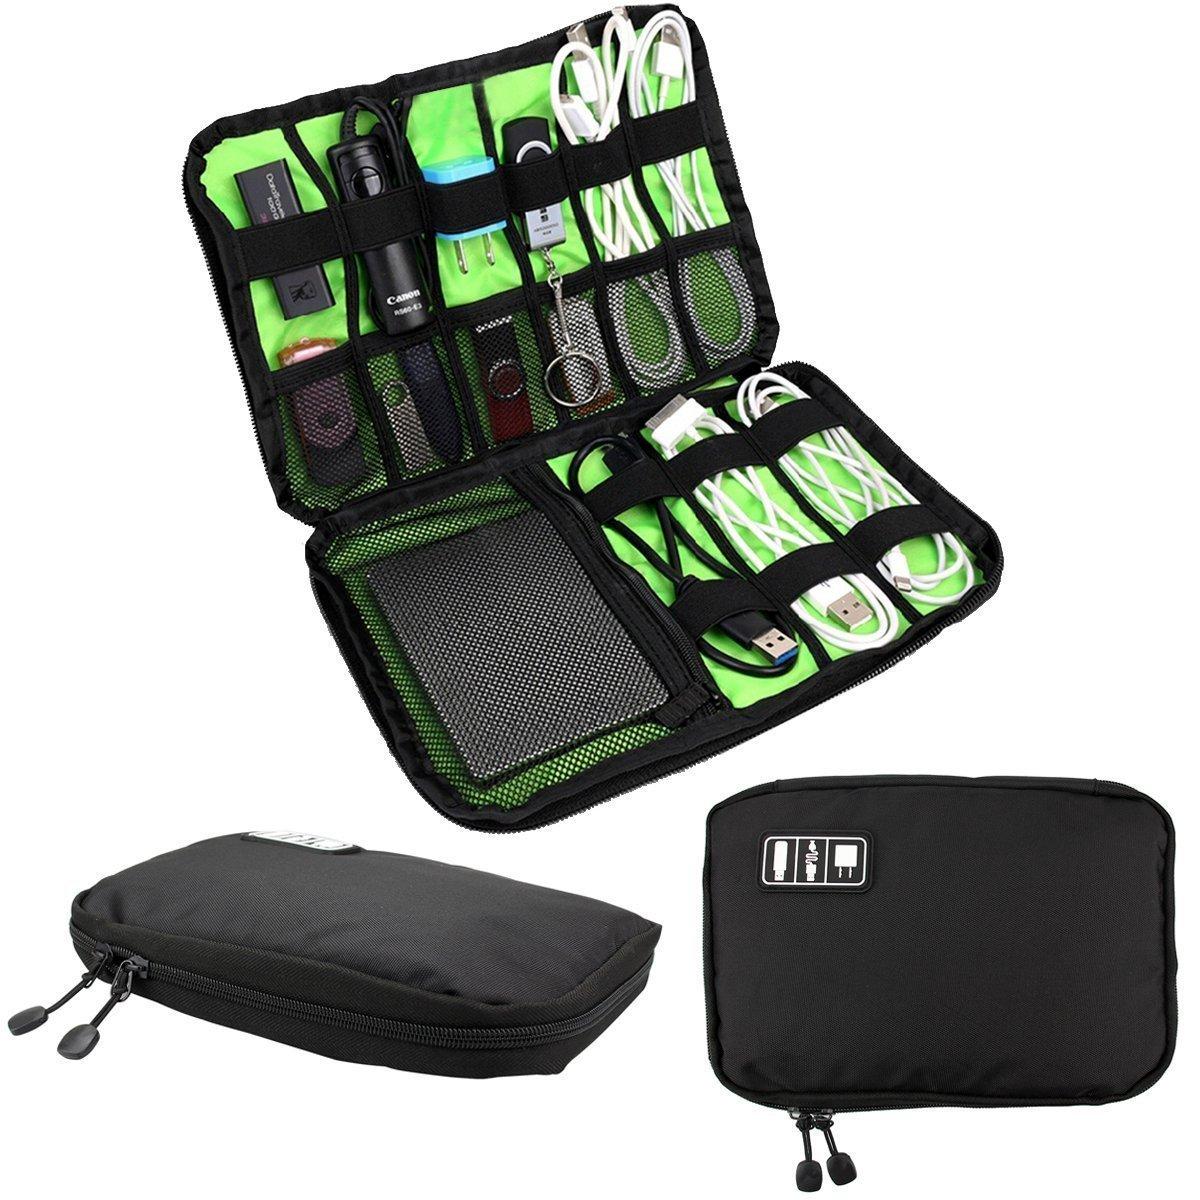 Estuche Romote organizador de cables Accesorios Electrónica bolsa de viaje del disco duro para USB cargador de teléfono Banco de alimentación: Amazon.es: Hogar